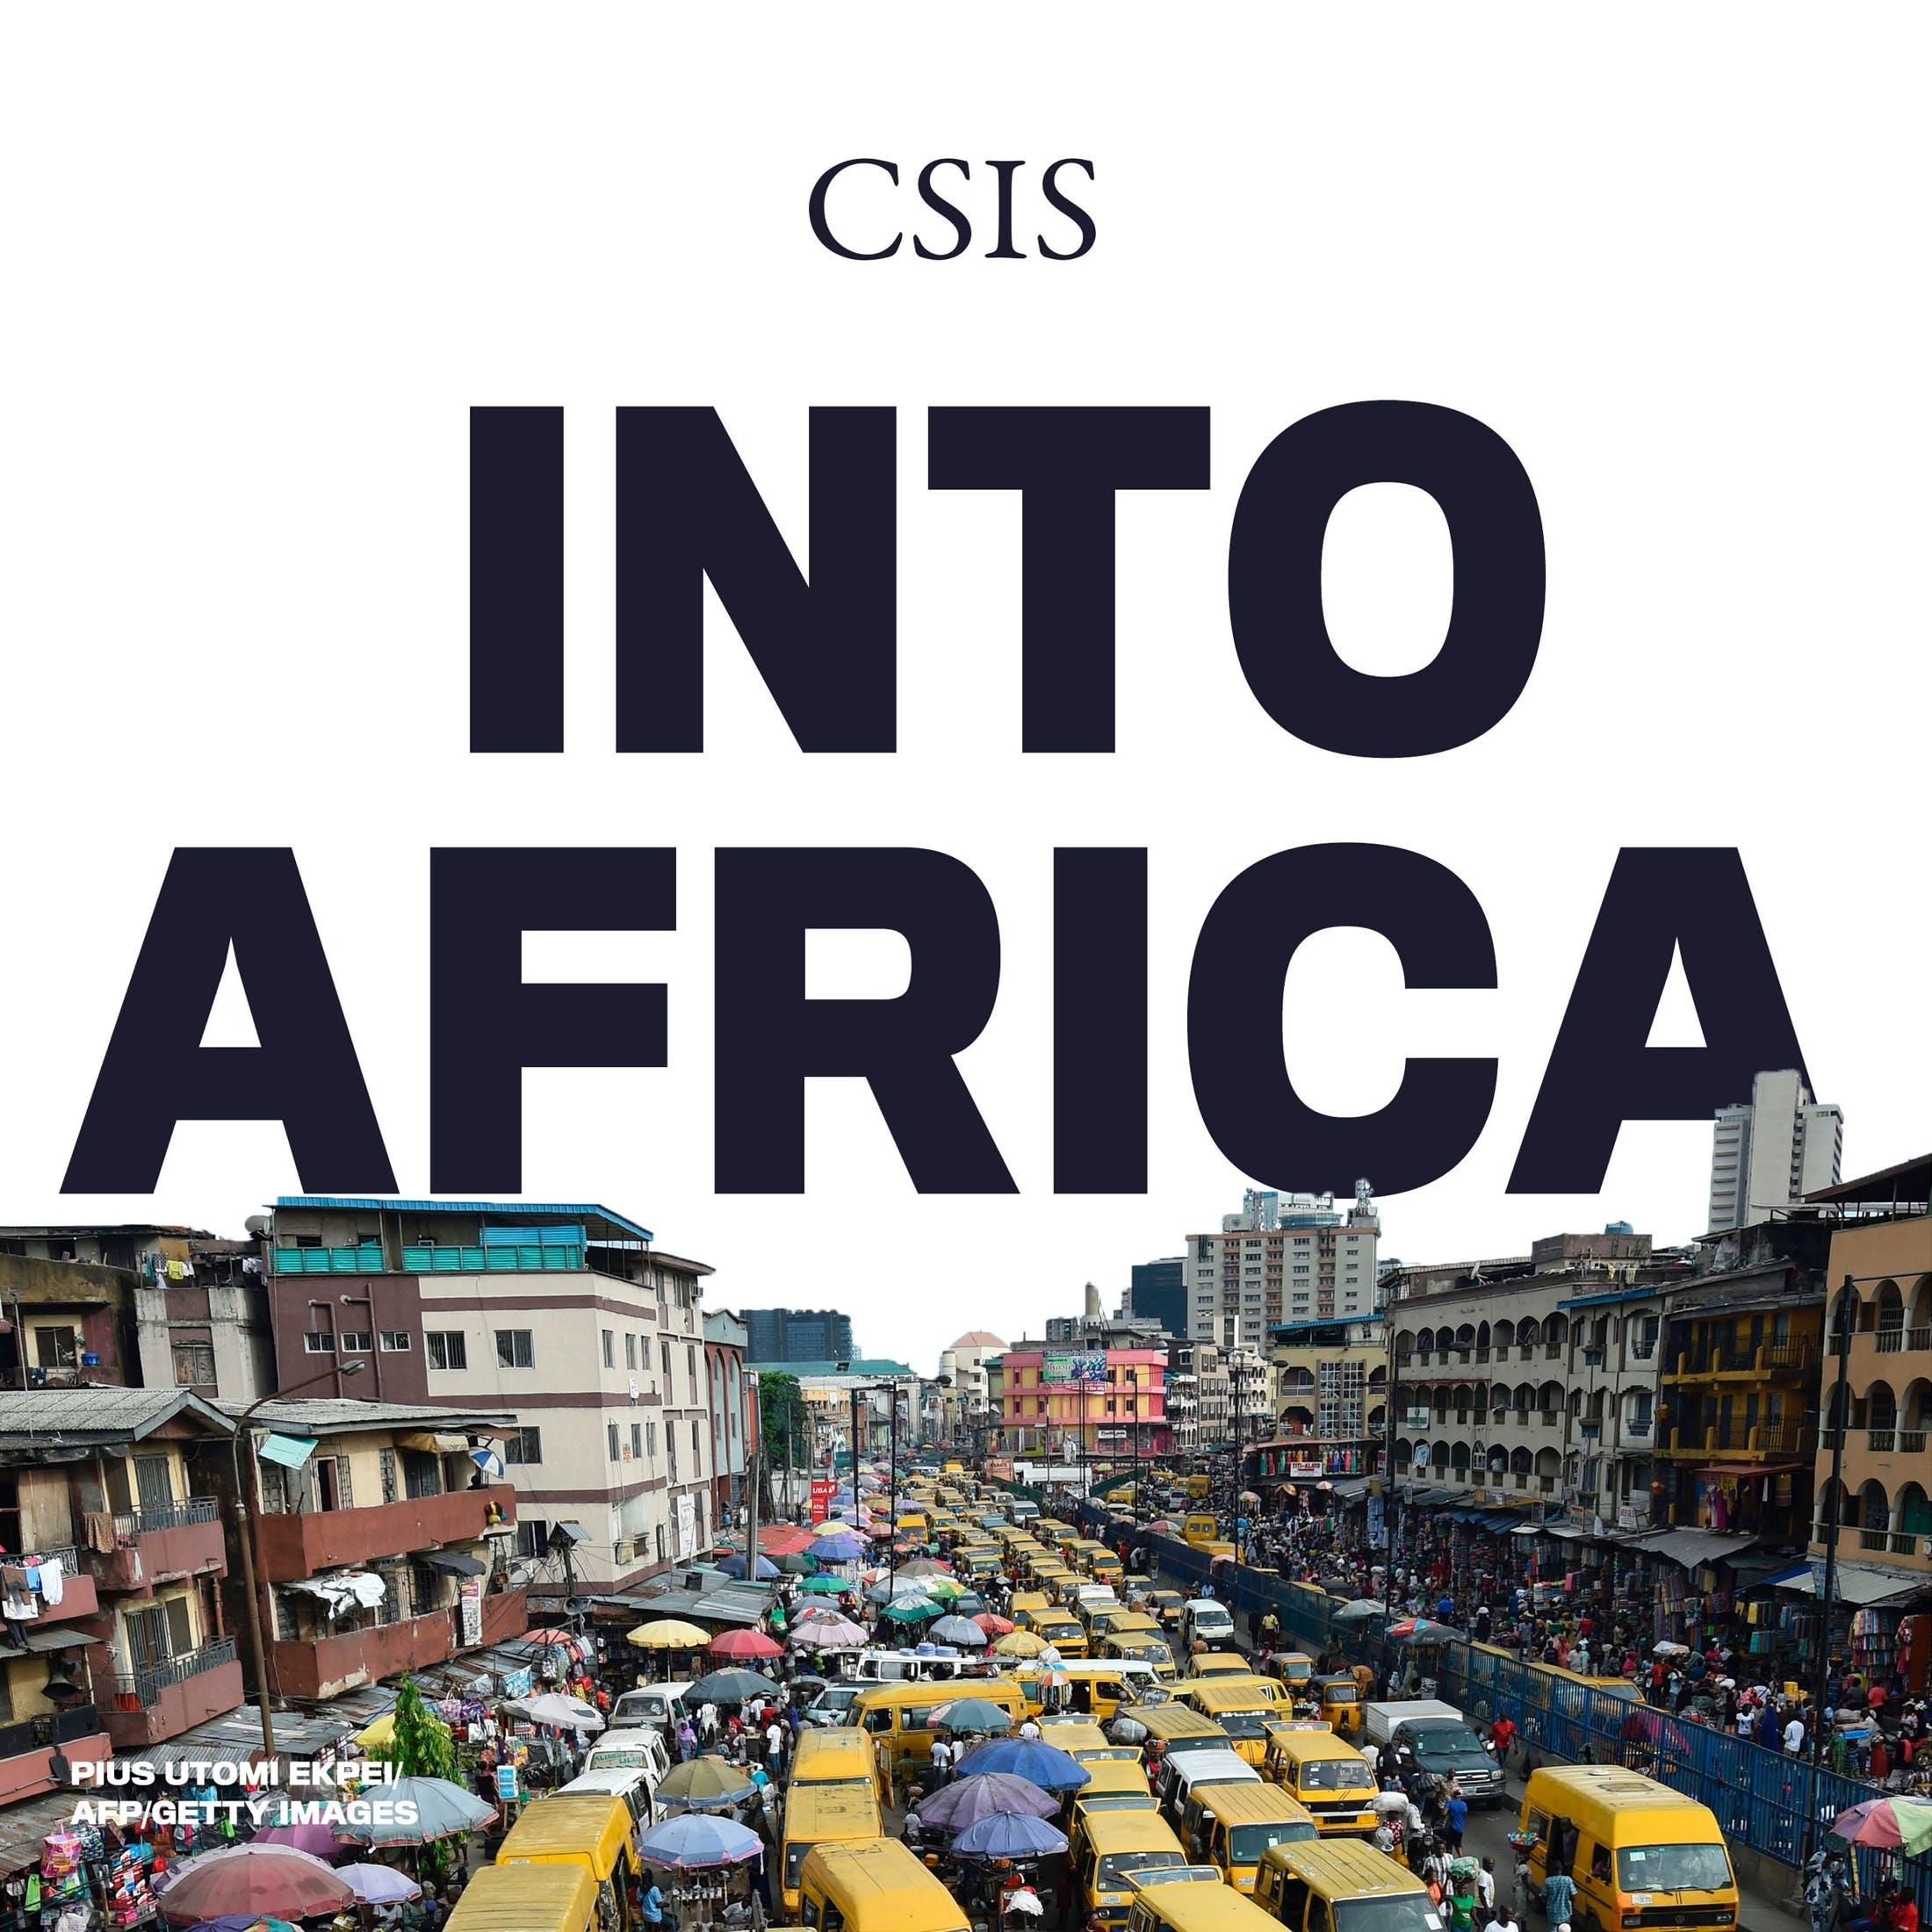 Africa on Africa